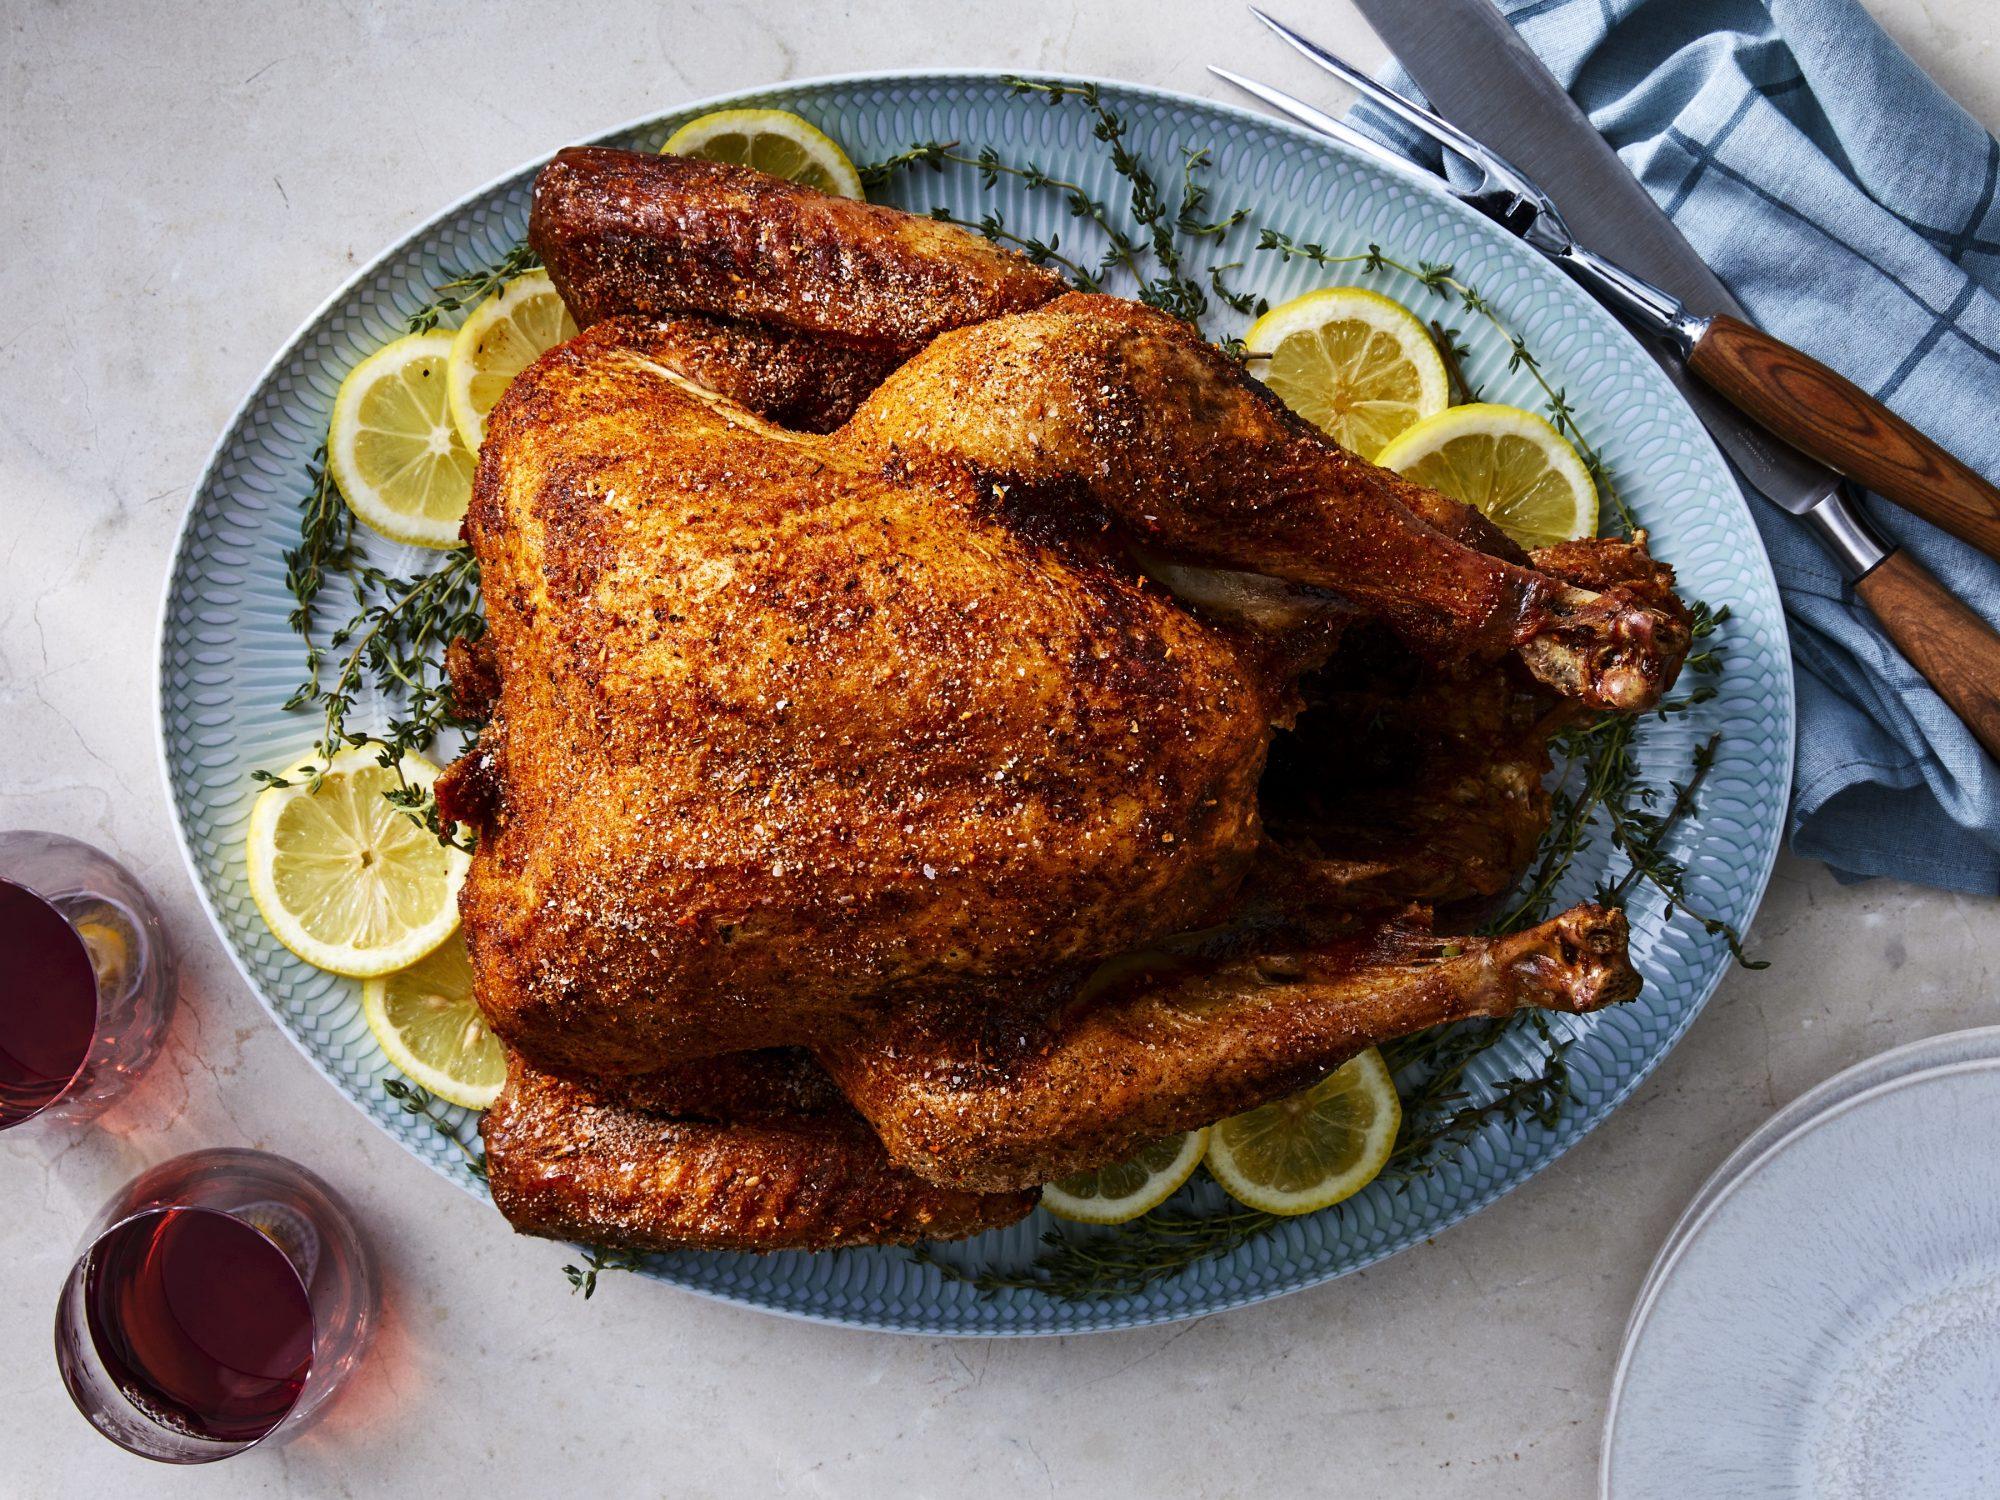 mr - Cajun Fried Turkey Image